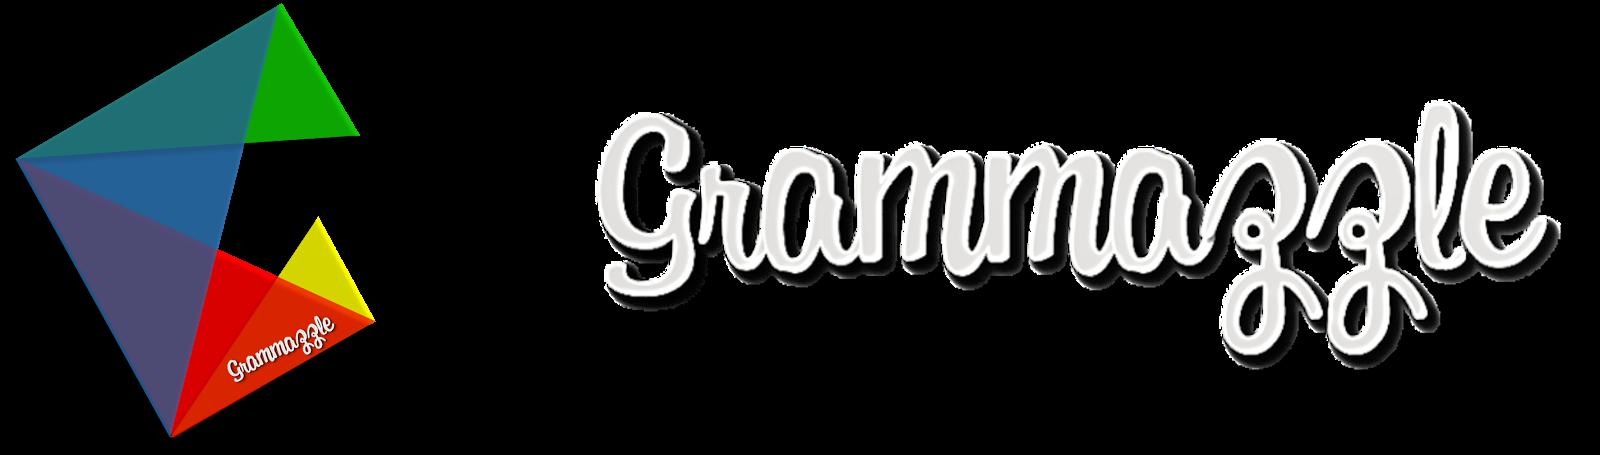 Grammazzle Nueva Etapa Logo Nuevo